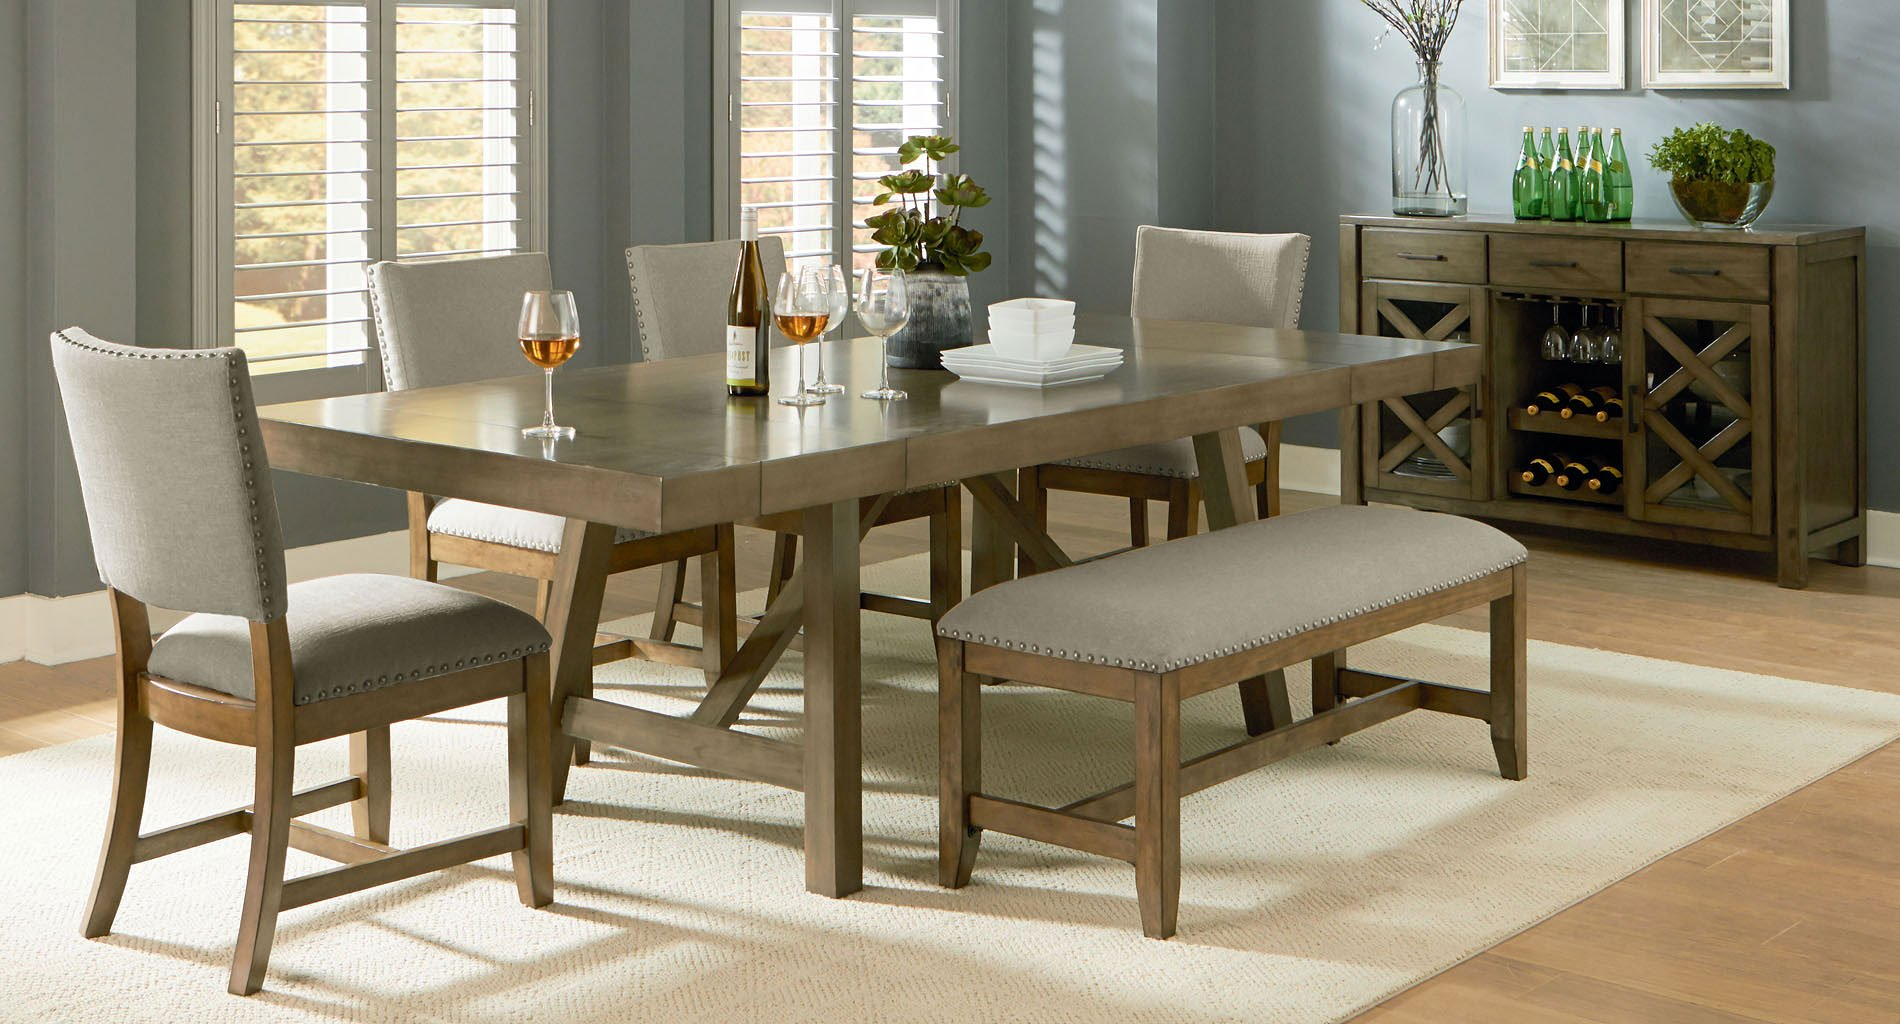 Omaha Dining Room Set W Upholstered Bench Grey Formal